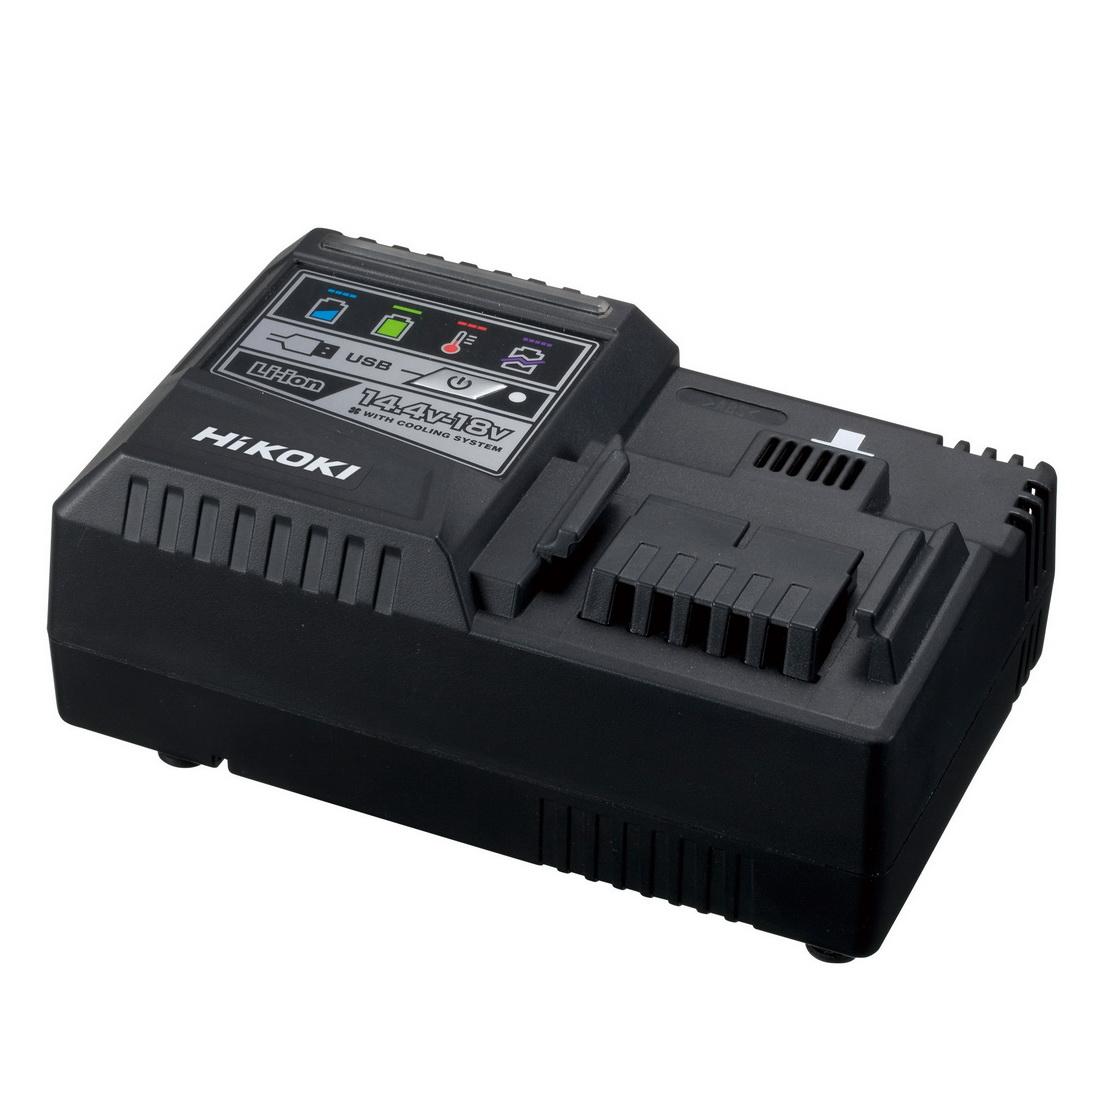 18V 38min Cordless Lithium-Ion Slide Rapid Smart Battery Charger